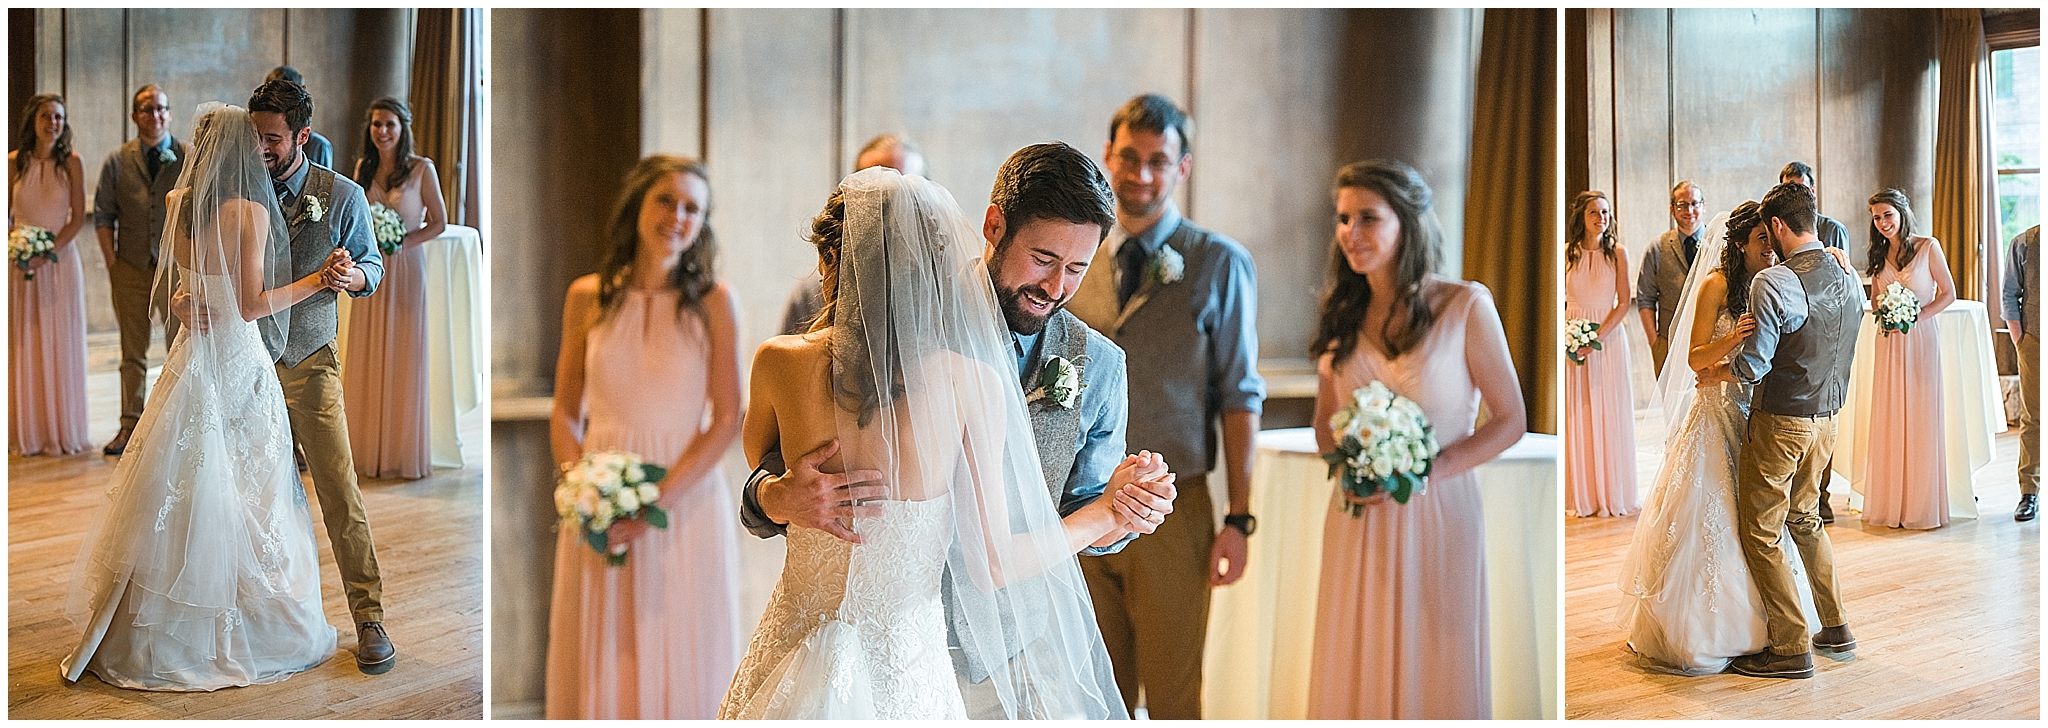 Wedding_Asheville_Century_Room_18.jpg